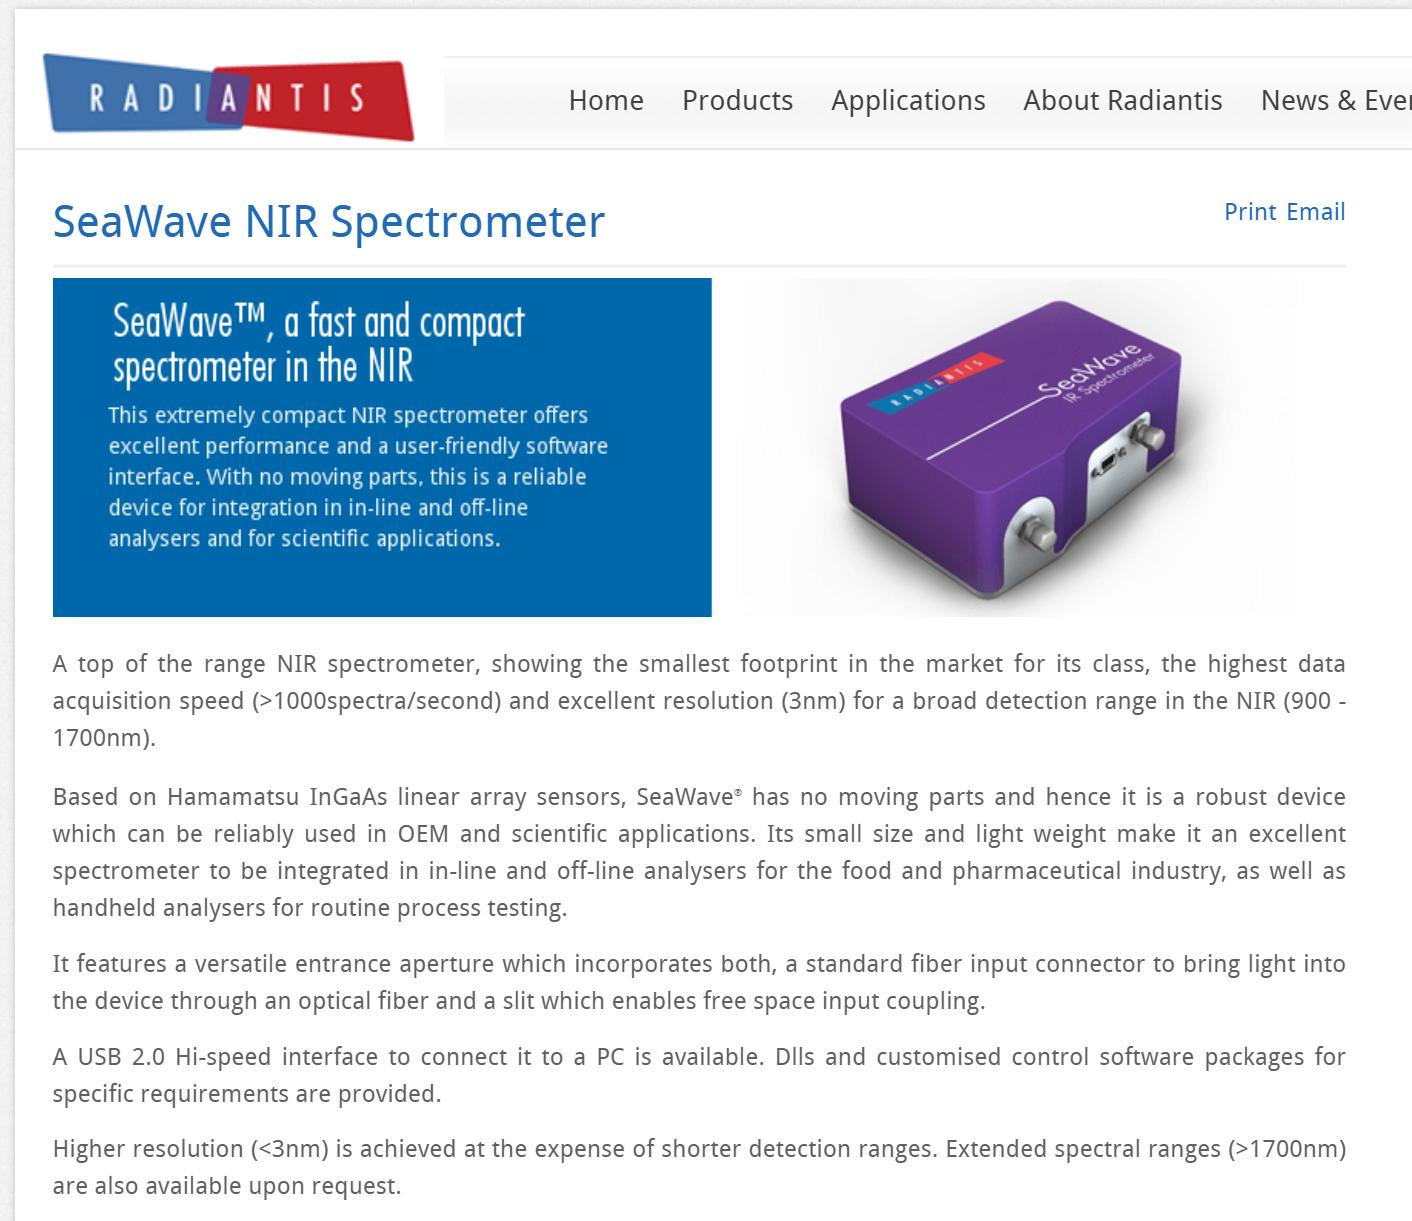 SeaWave NIR Spectrometer